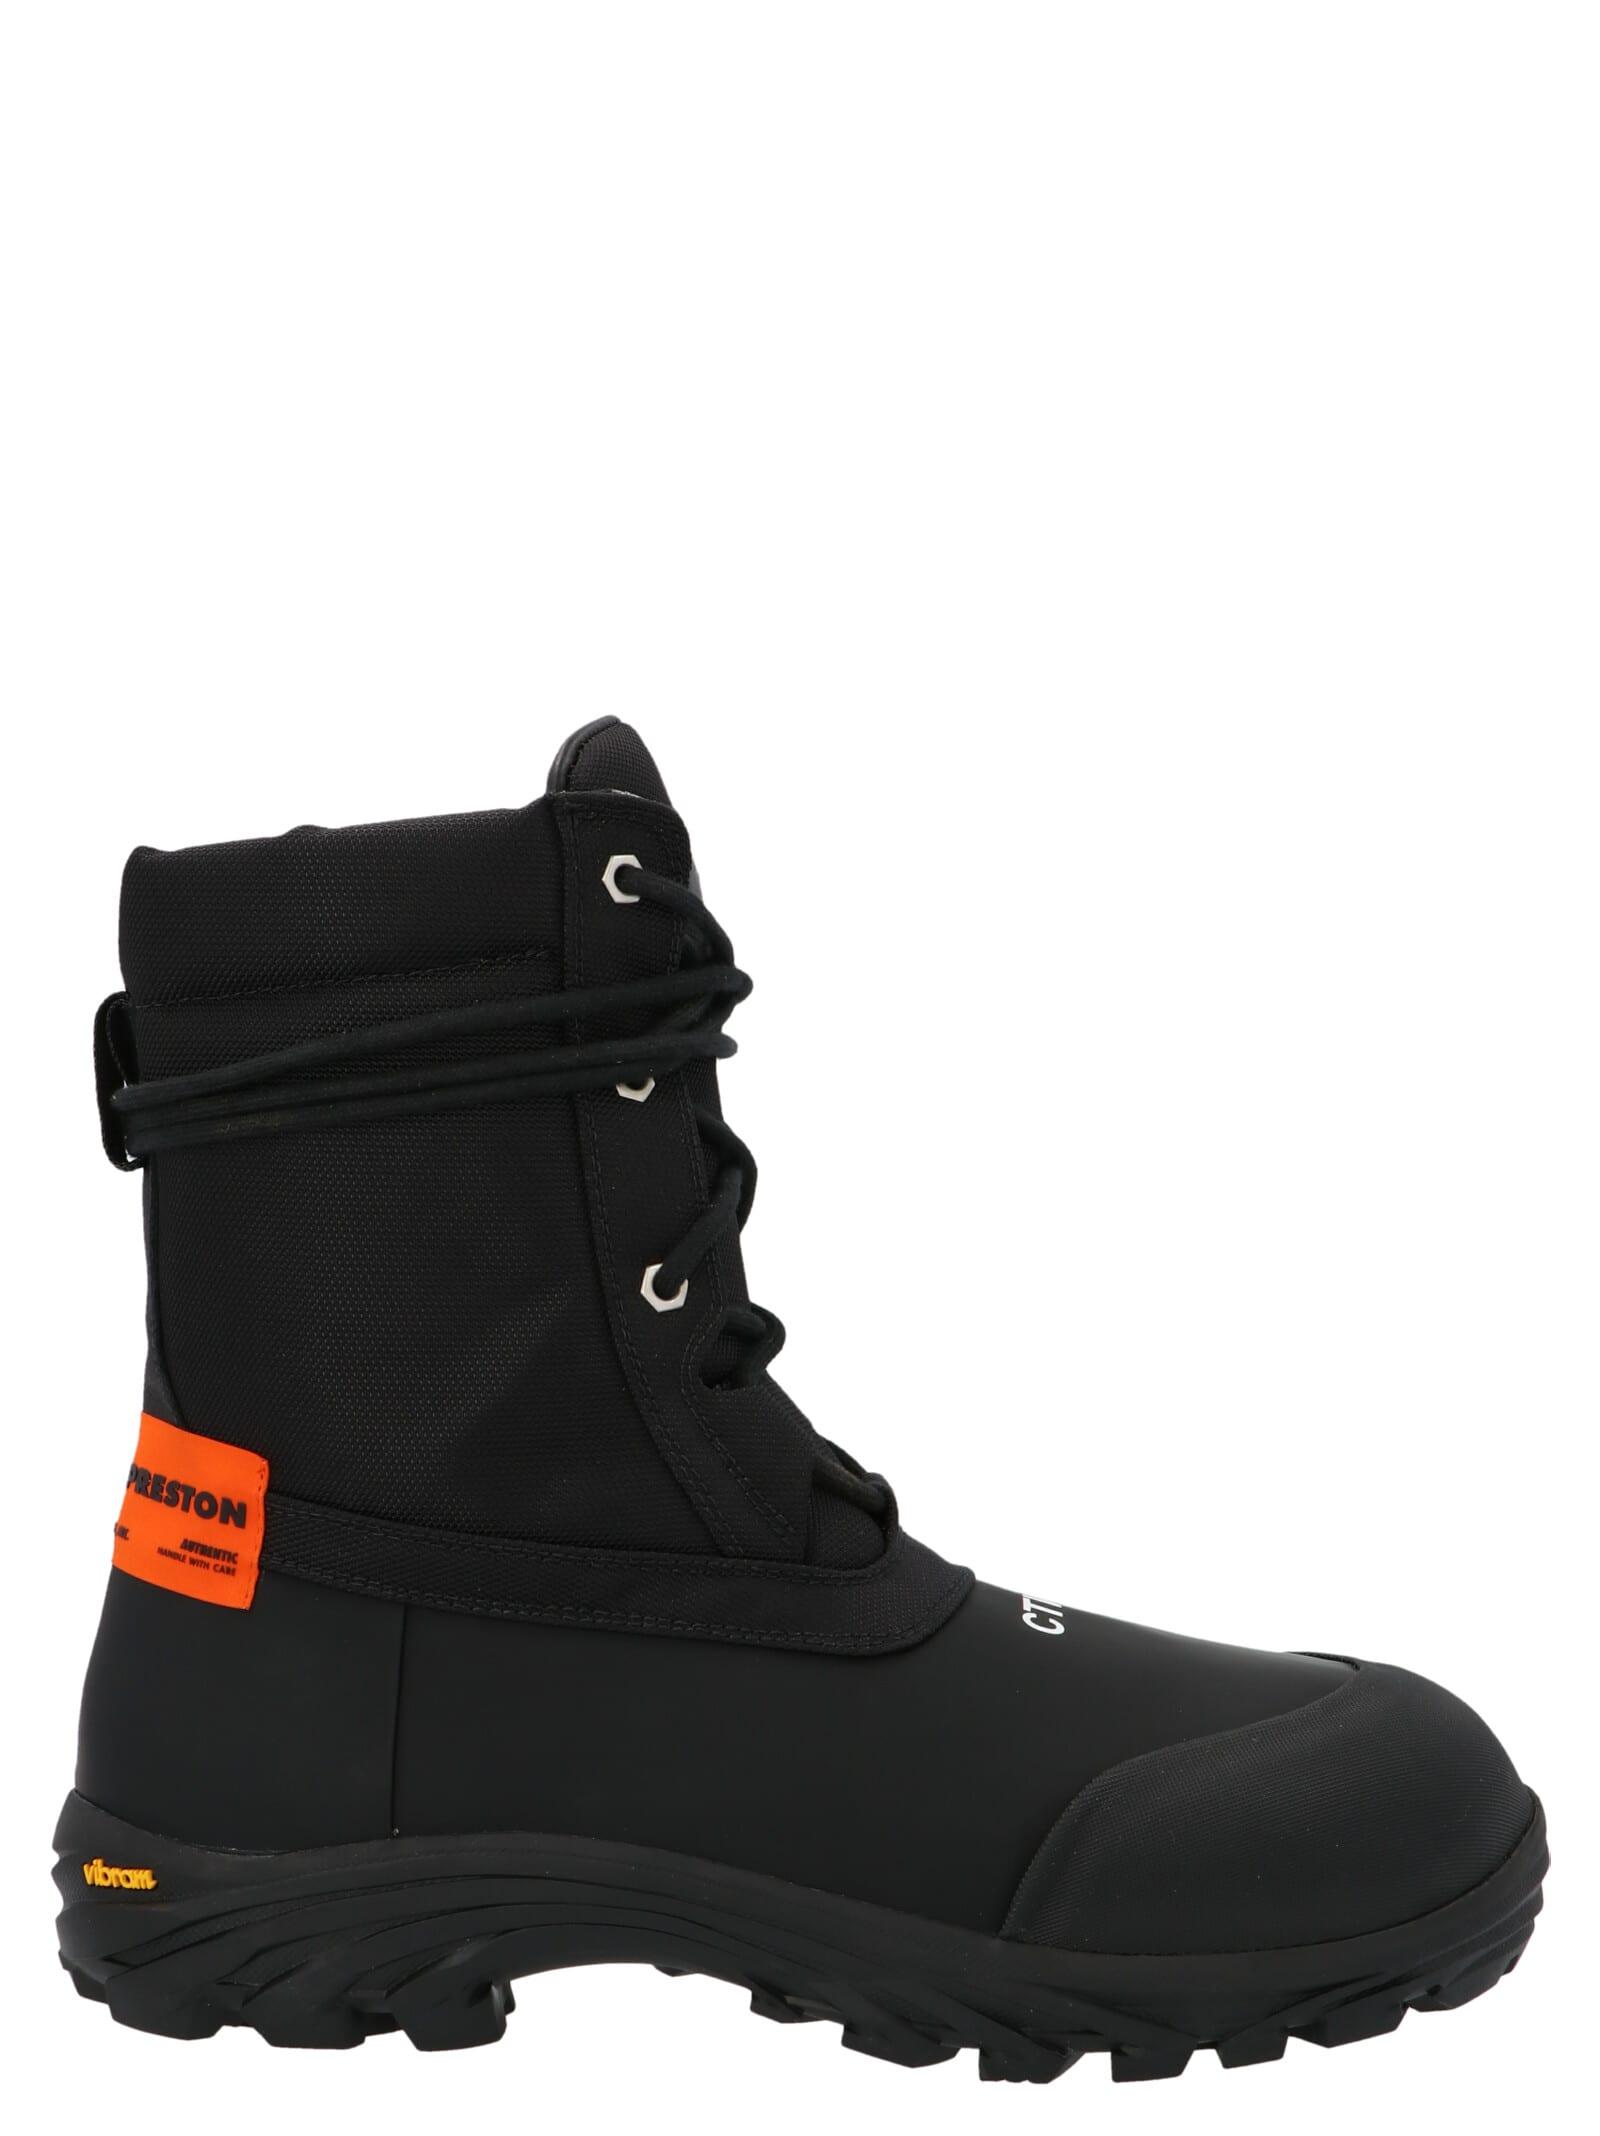 Heron Preston security Boot Boots